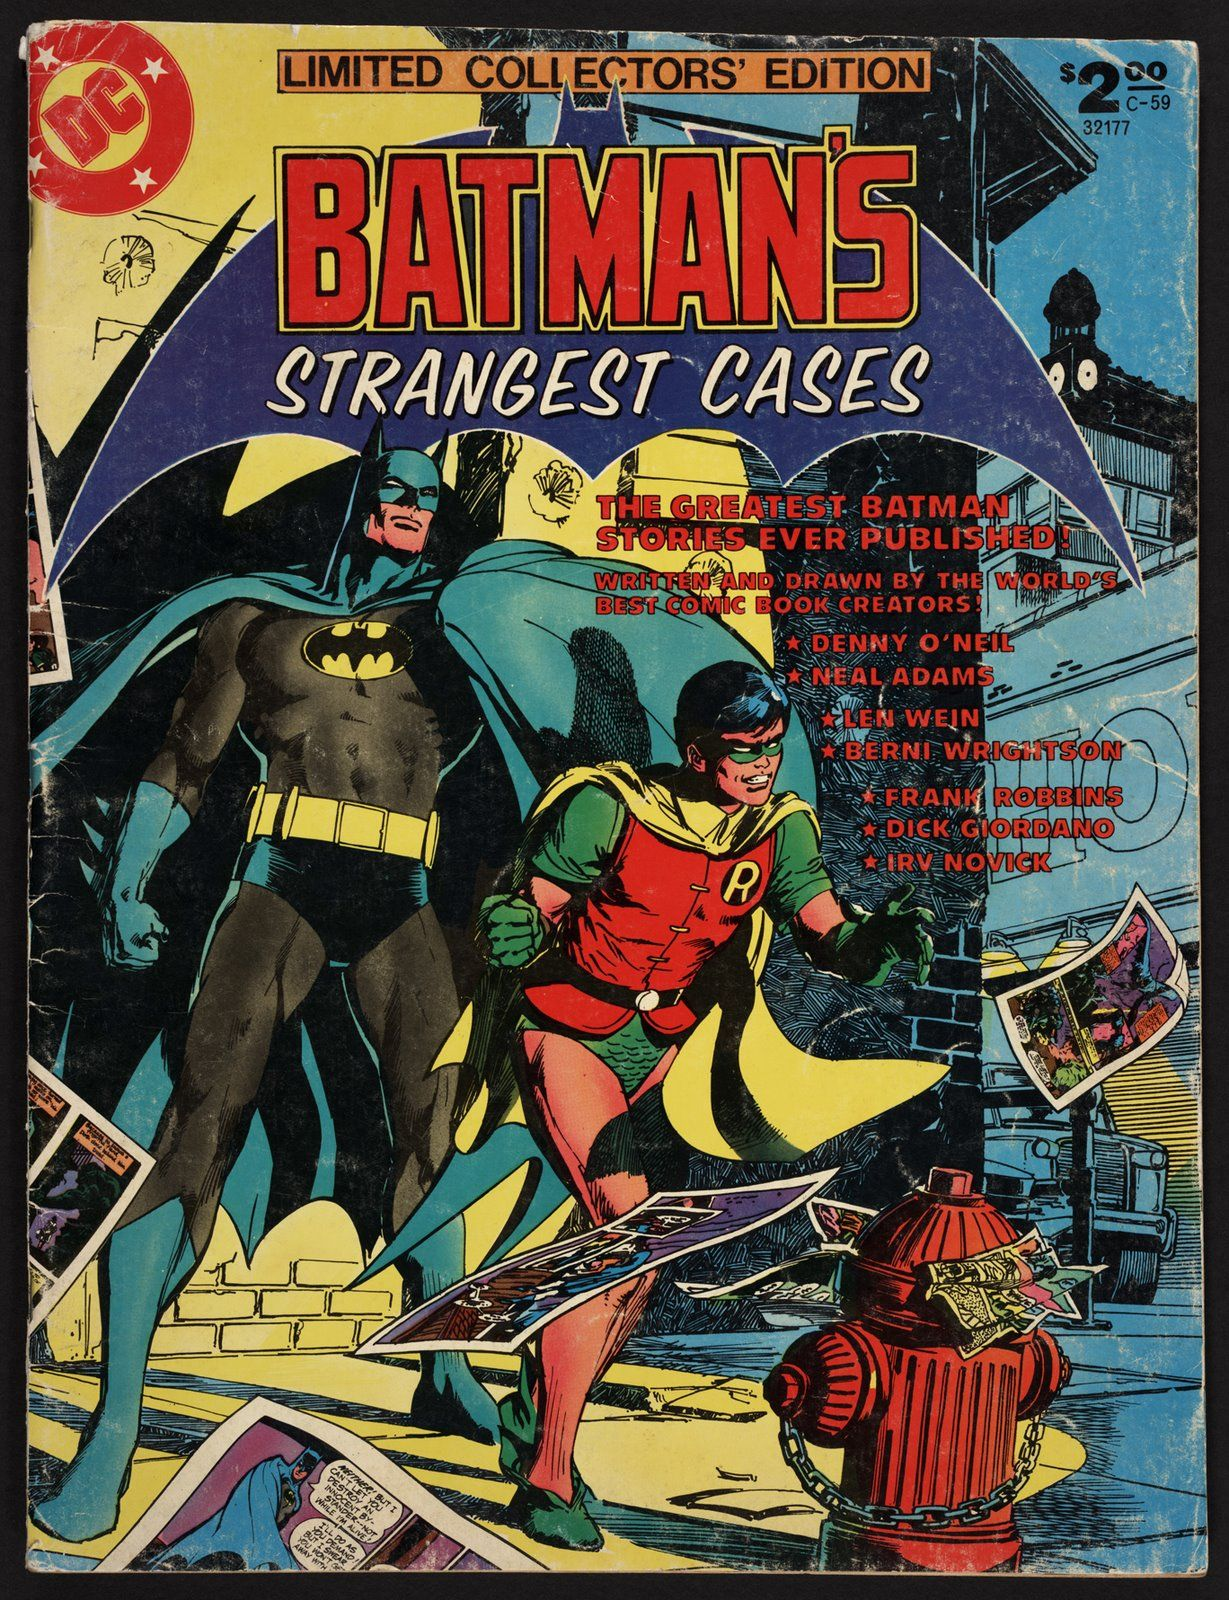 Treasury Edition, Tabloid-sized Comic Book.